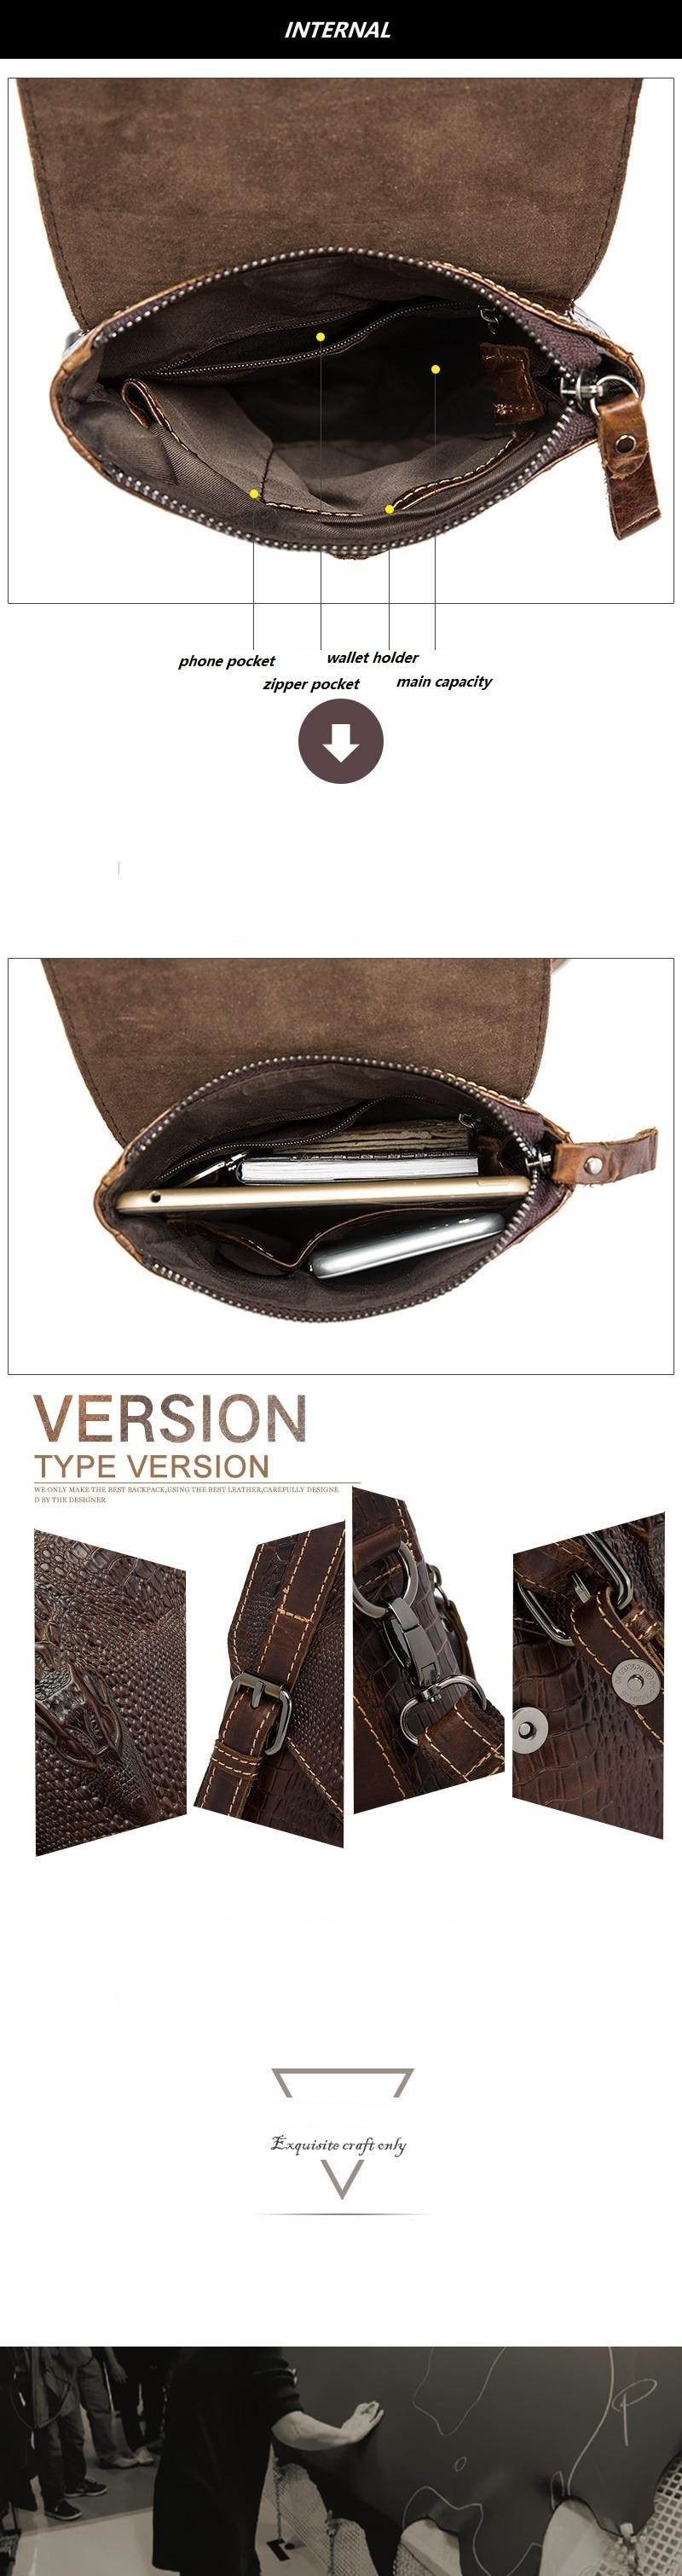 HTB1h4YnedLO8KJjSZPcq6yV0FXac Men Crocodile Classic Briefcase Genuine Leather Business Office Ipad Bag Lawyer Handbag Portfolio Satchel Alligator Shoulder bag